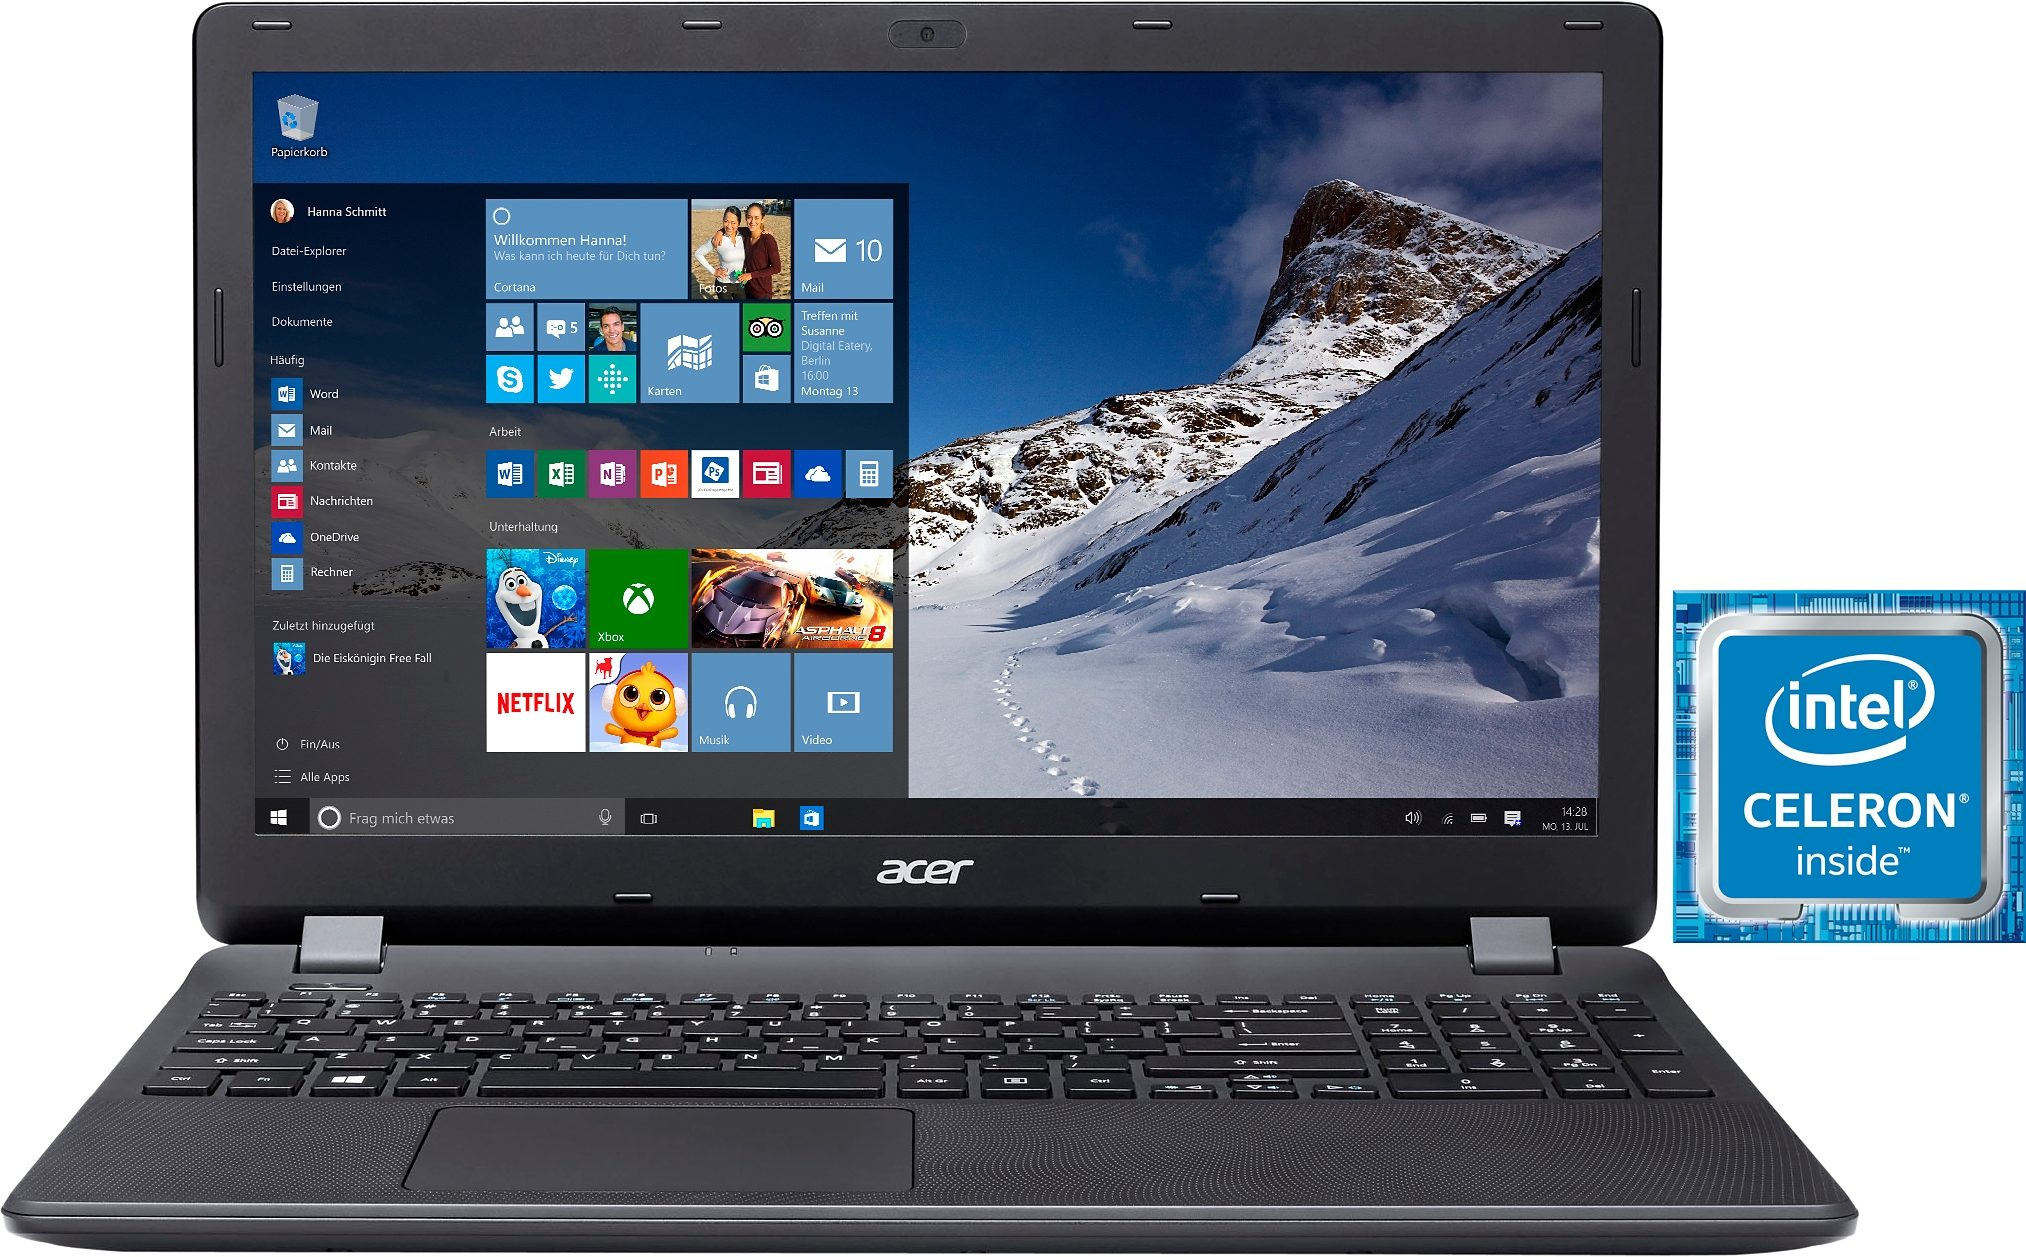 Acer Aspire ES1-531-C8QS Notebook, Intel® Celeron™, 39,6 cm (15,6 Zoll), 500 GB Speicher